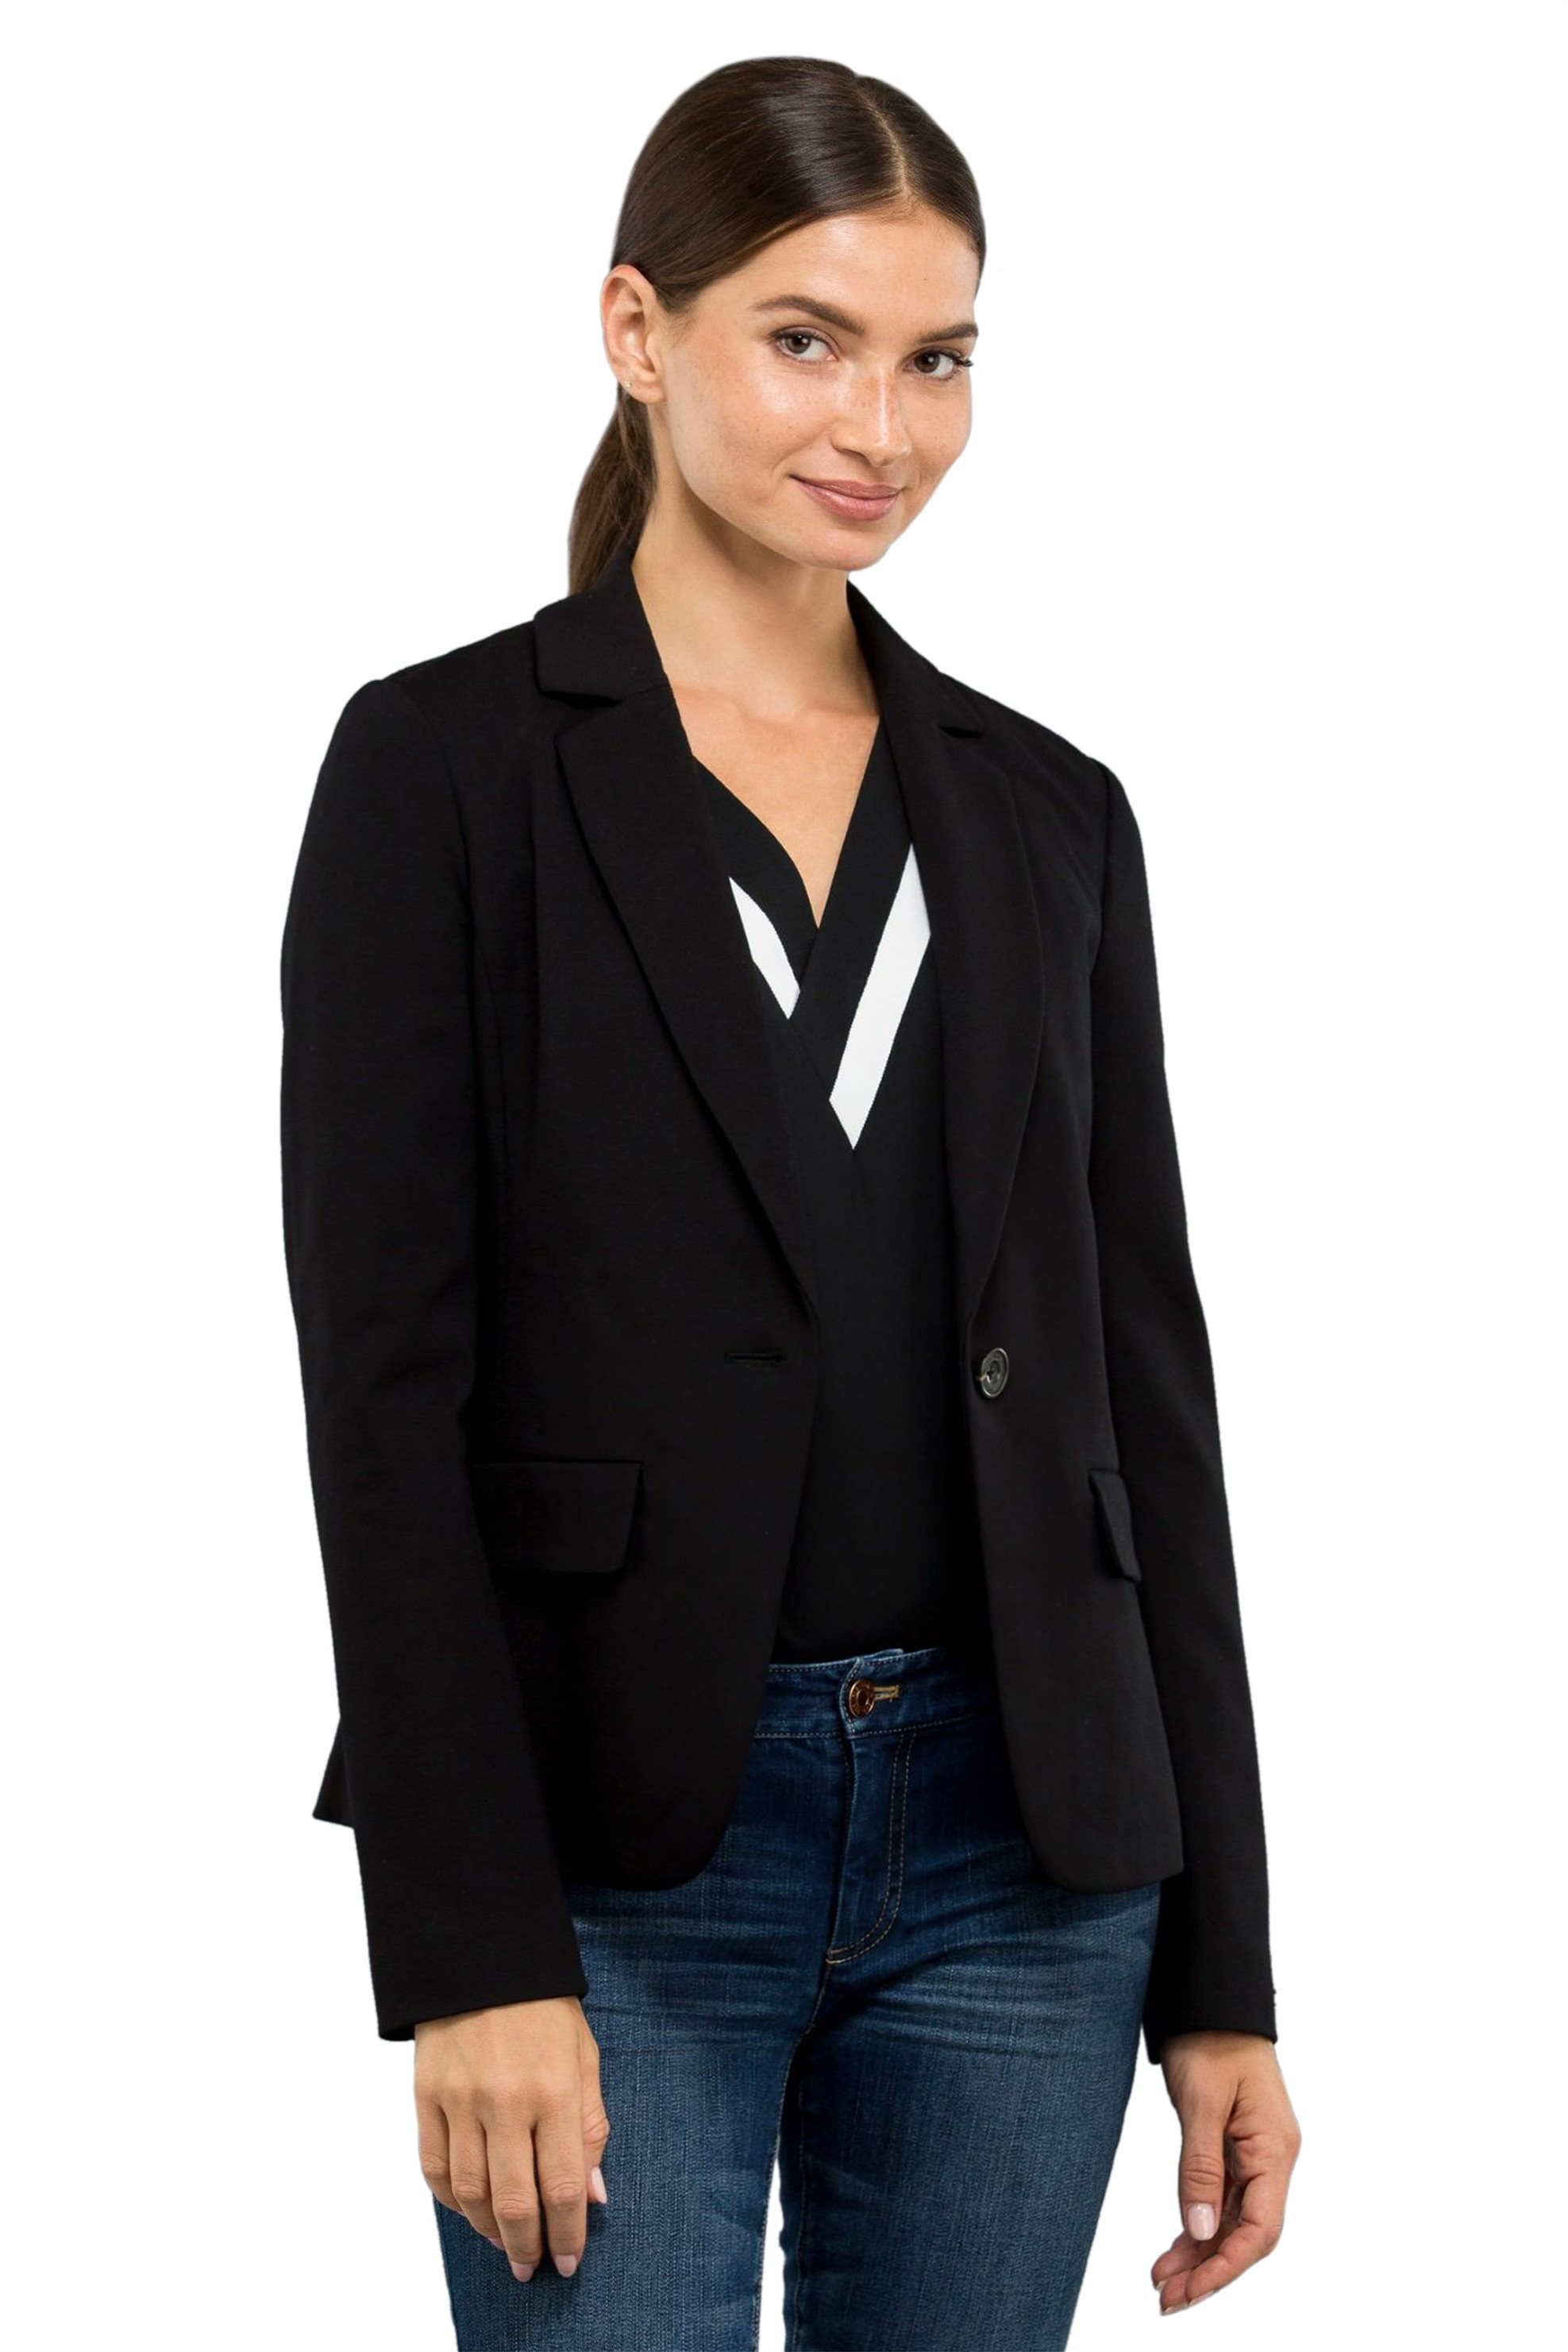 6c460d13f40c Notos Nautica γυναικείο κλασσικό σακάκι με ένα κουμπί - 83J241 - Μαύρο